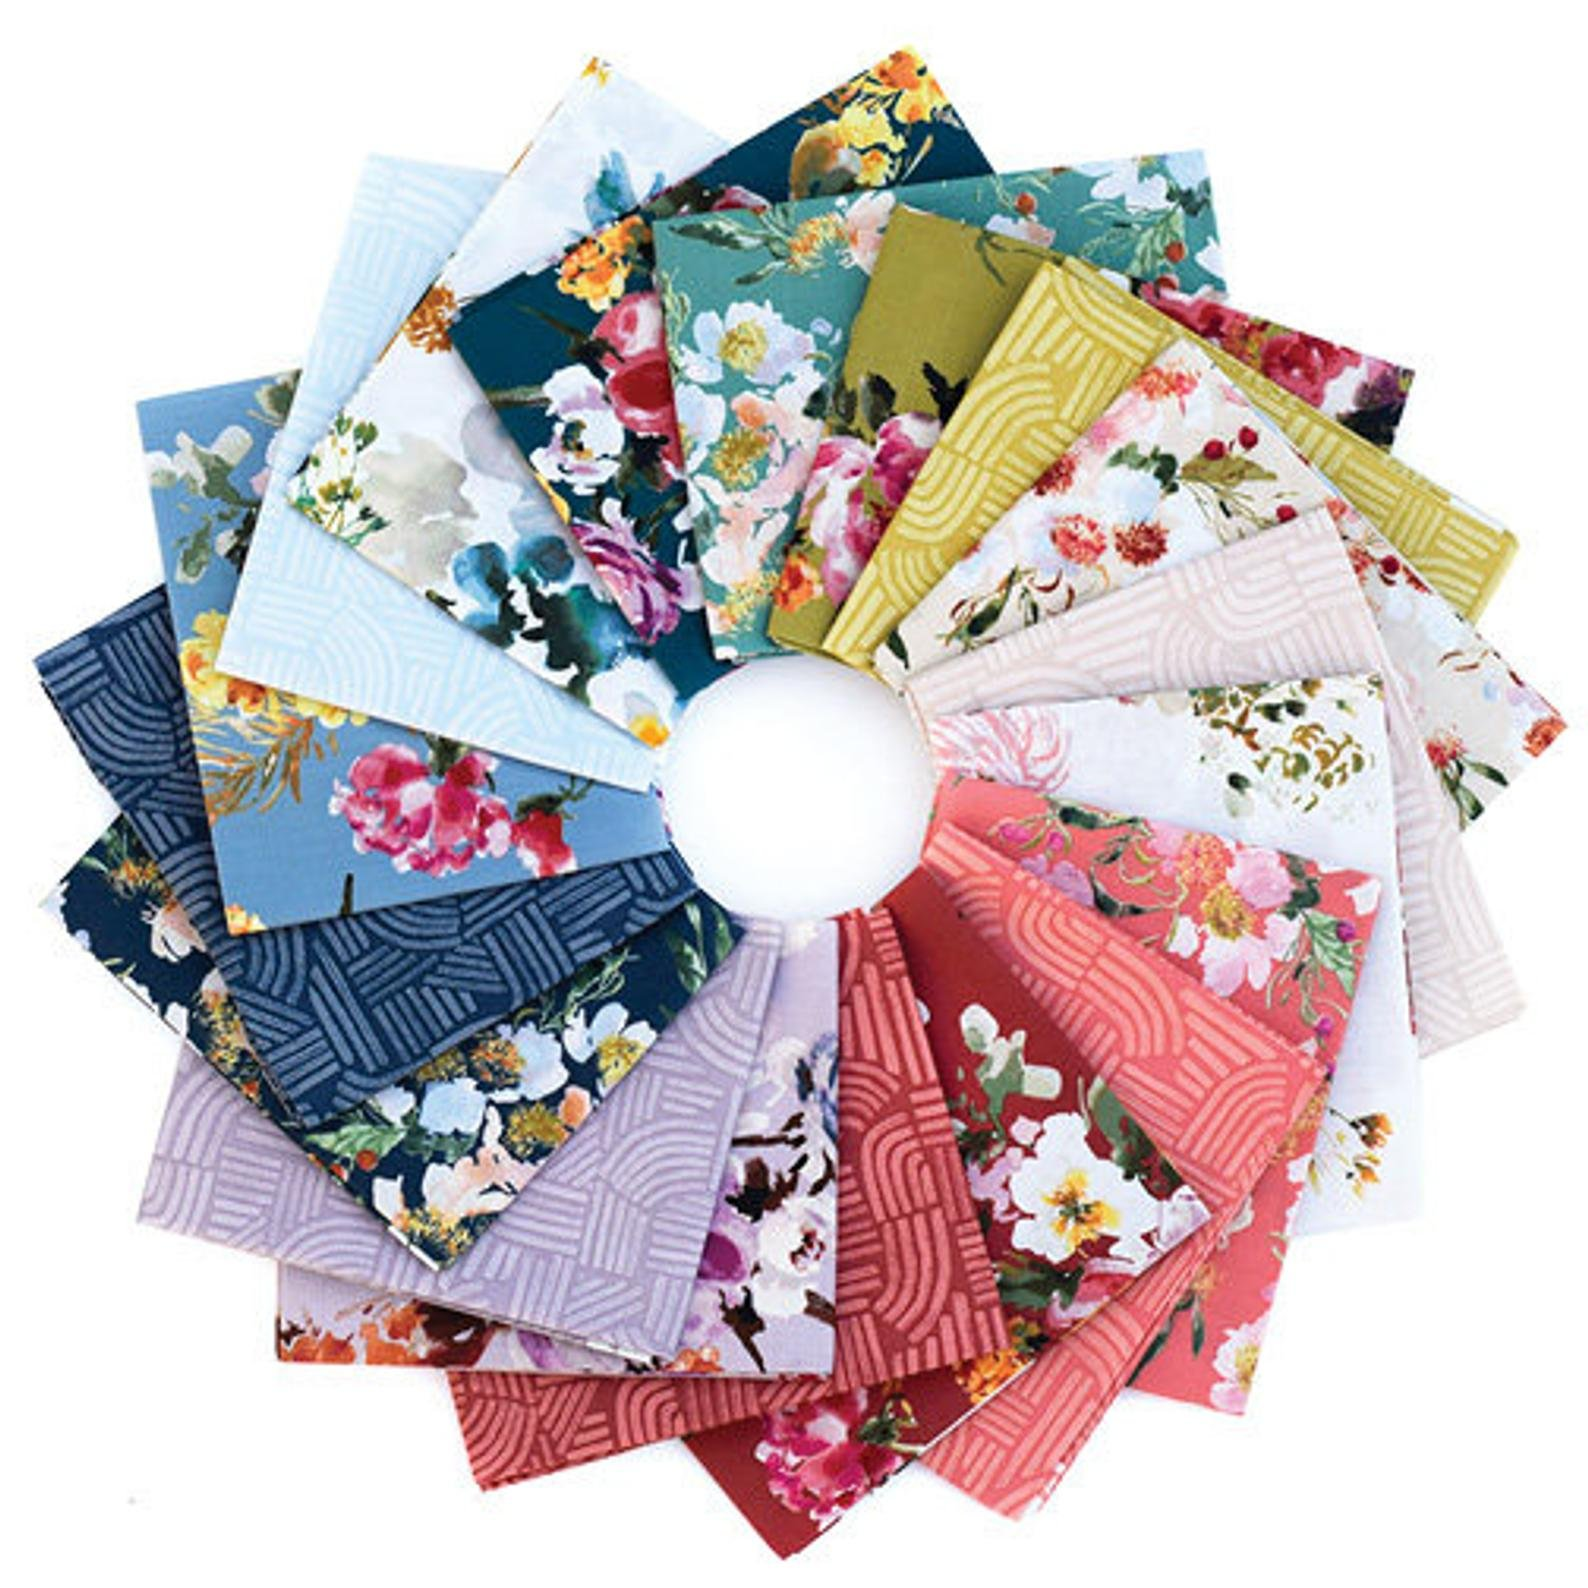 Wildflower Fat Quarter Bundle of 18 FQ for Windham Fabrics